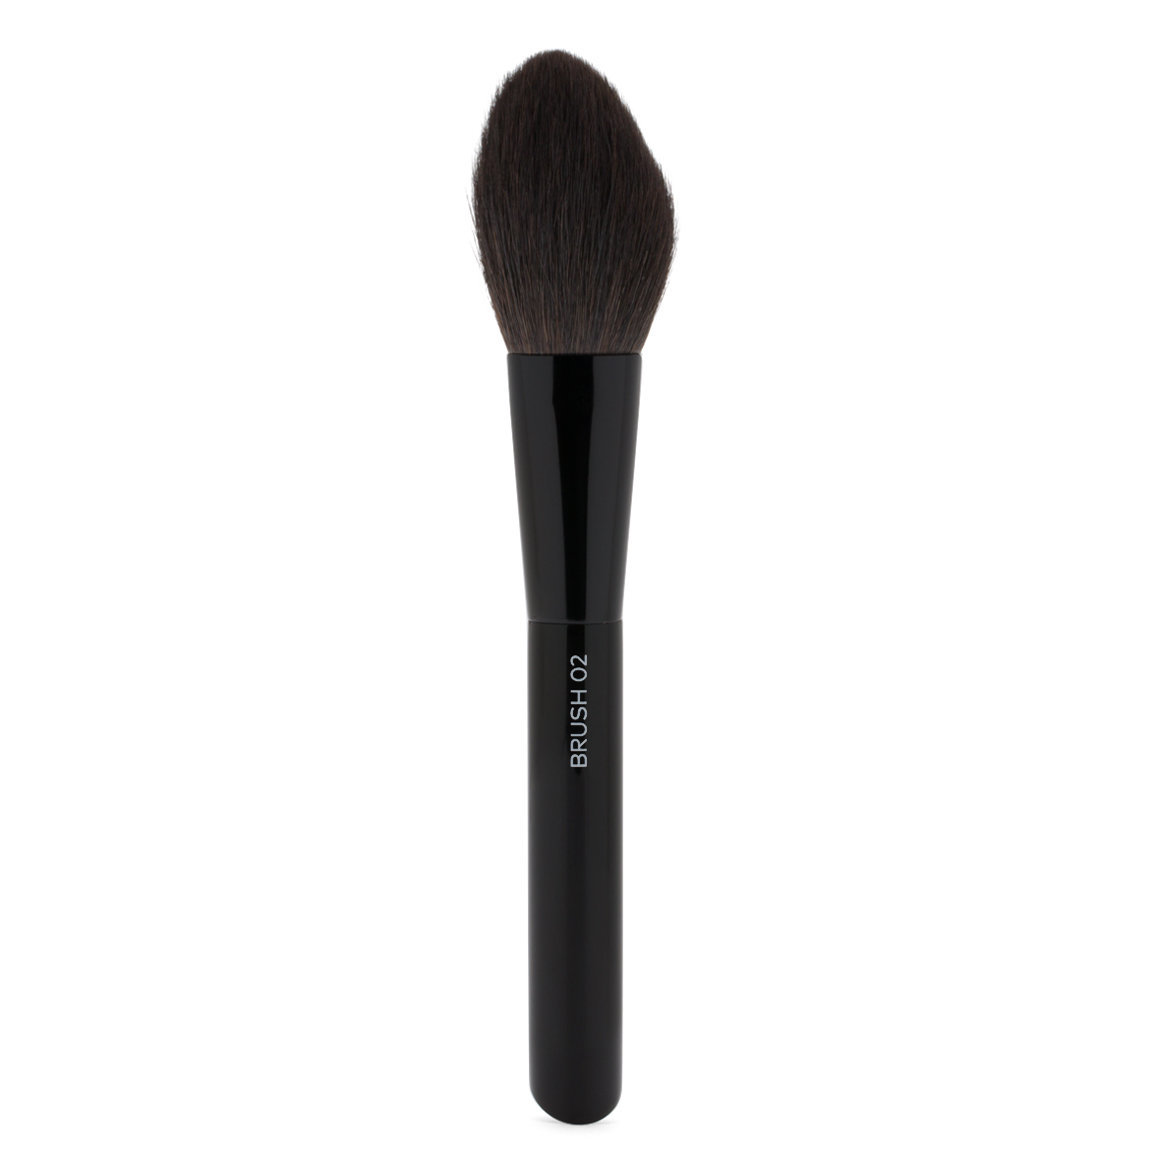 Beautylish Presents Yano Series Brush 02 Angled Powder alternative view 1 - product swatch.